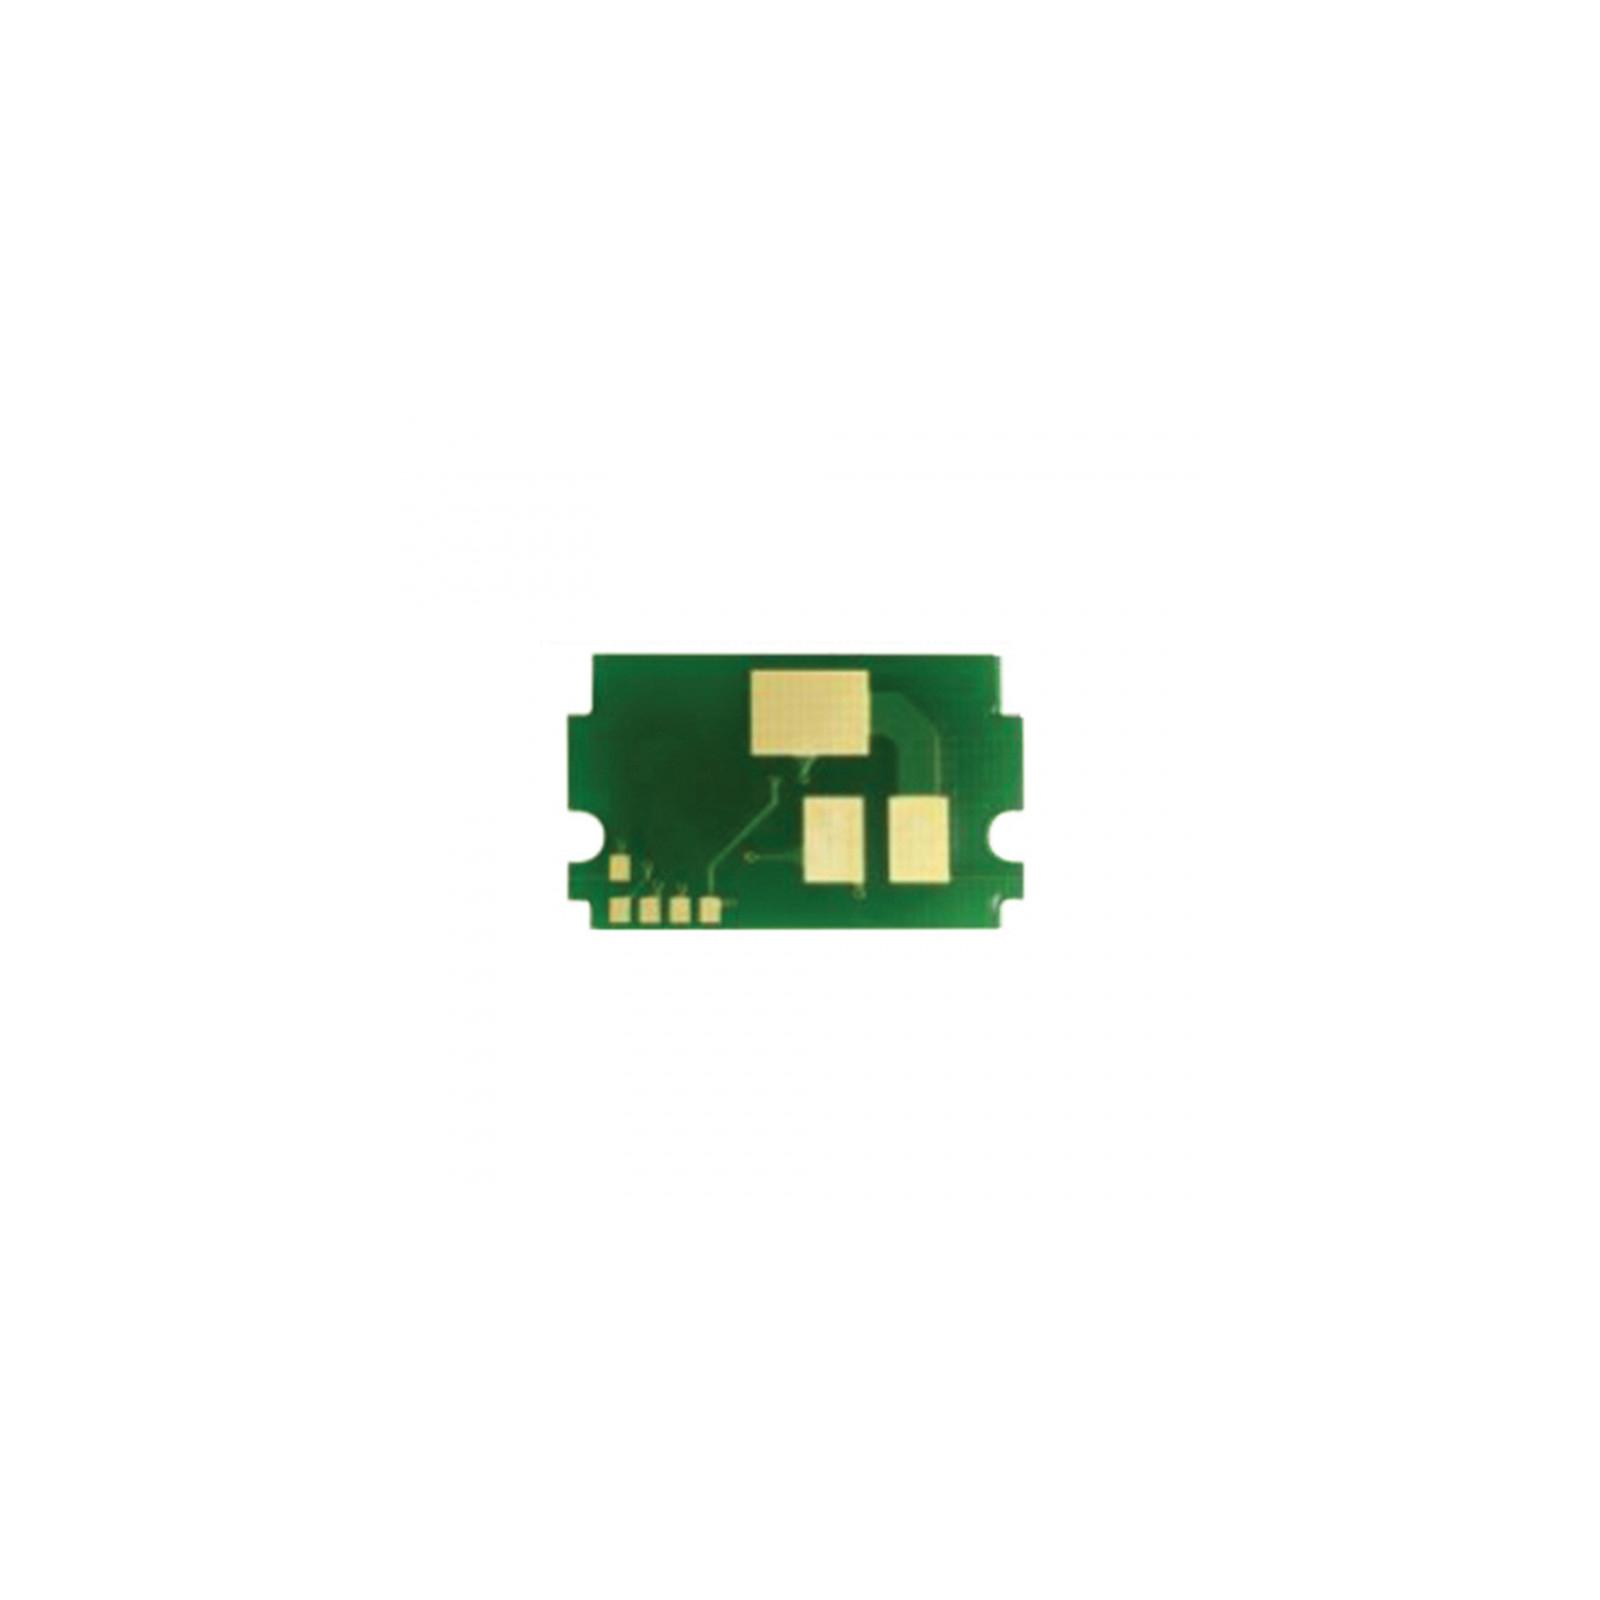 Чип для картриджа Kyocera TK-5220Y 1.2k yellow Static Control (TK5220CP-YEU)